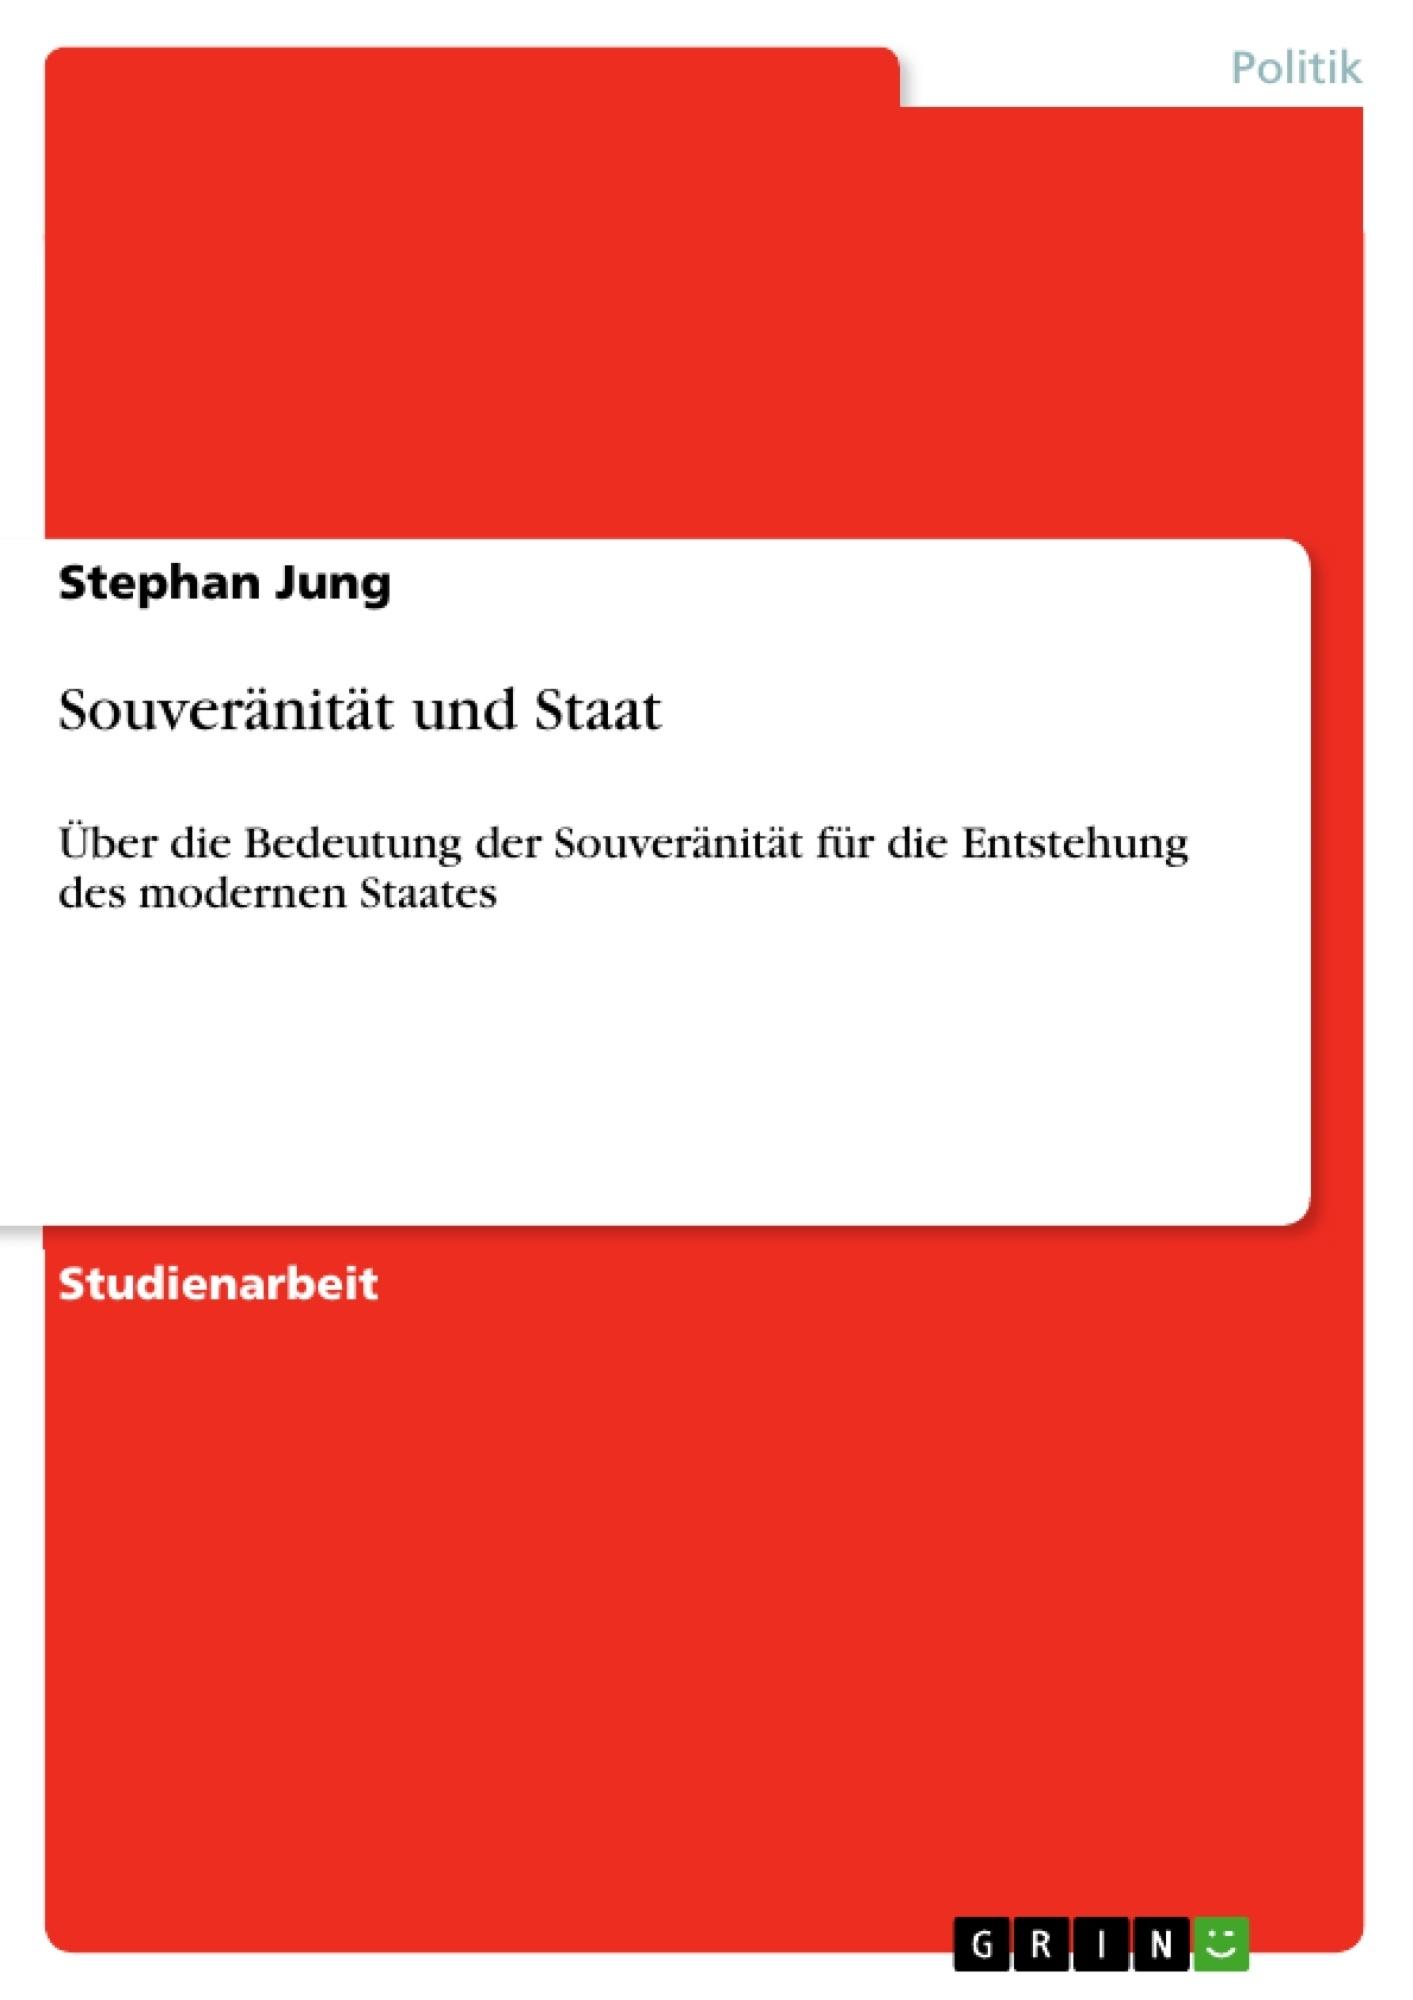 Titel: Souveränität und Staat